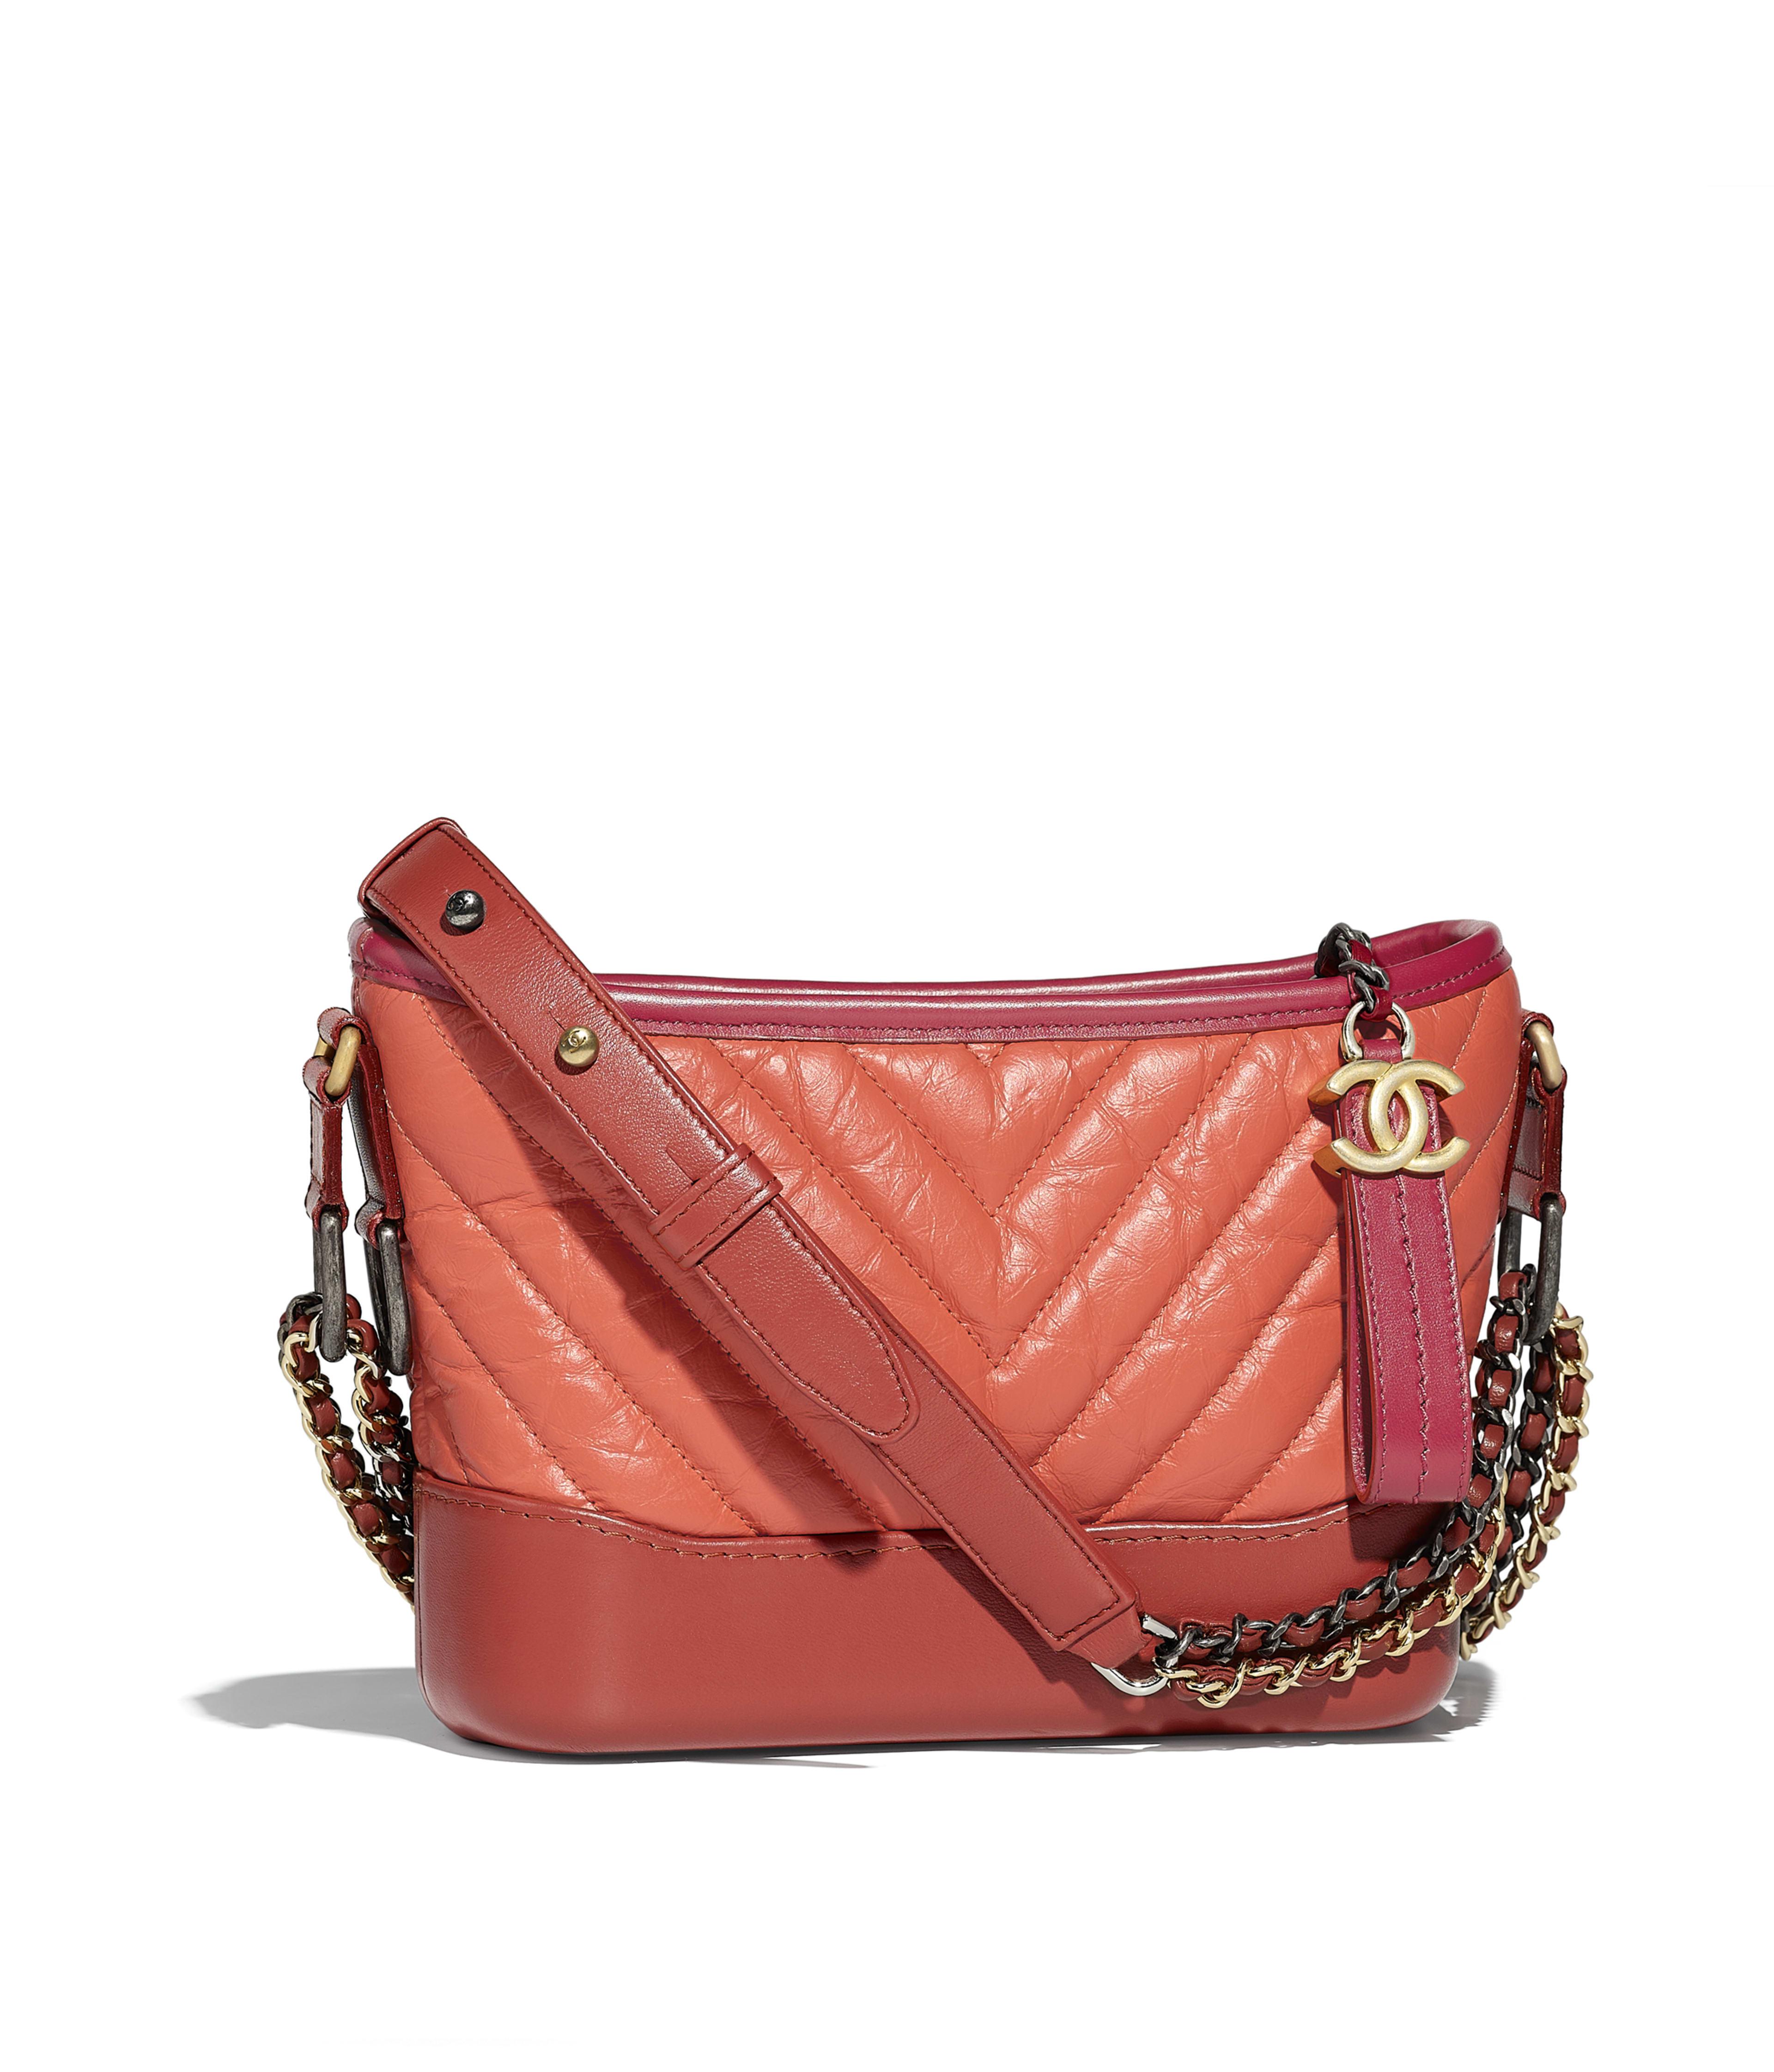 Bags for Women - Buy Trendy Women s Bags Online  c7bc5111aa8e